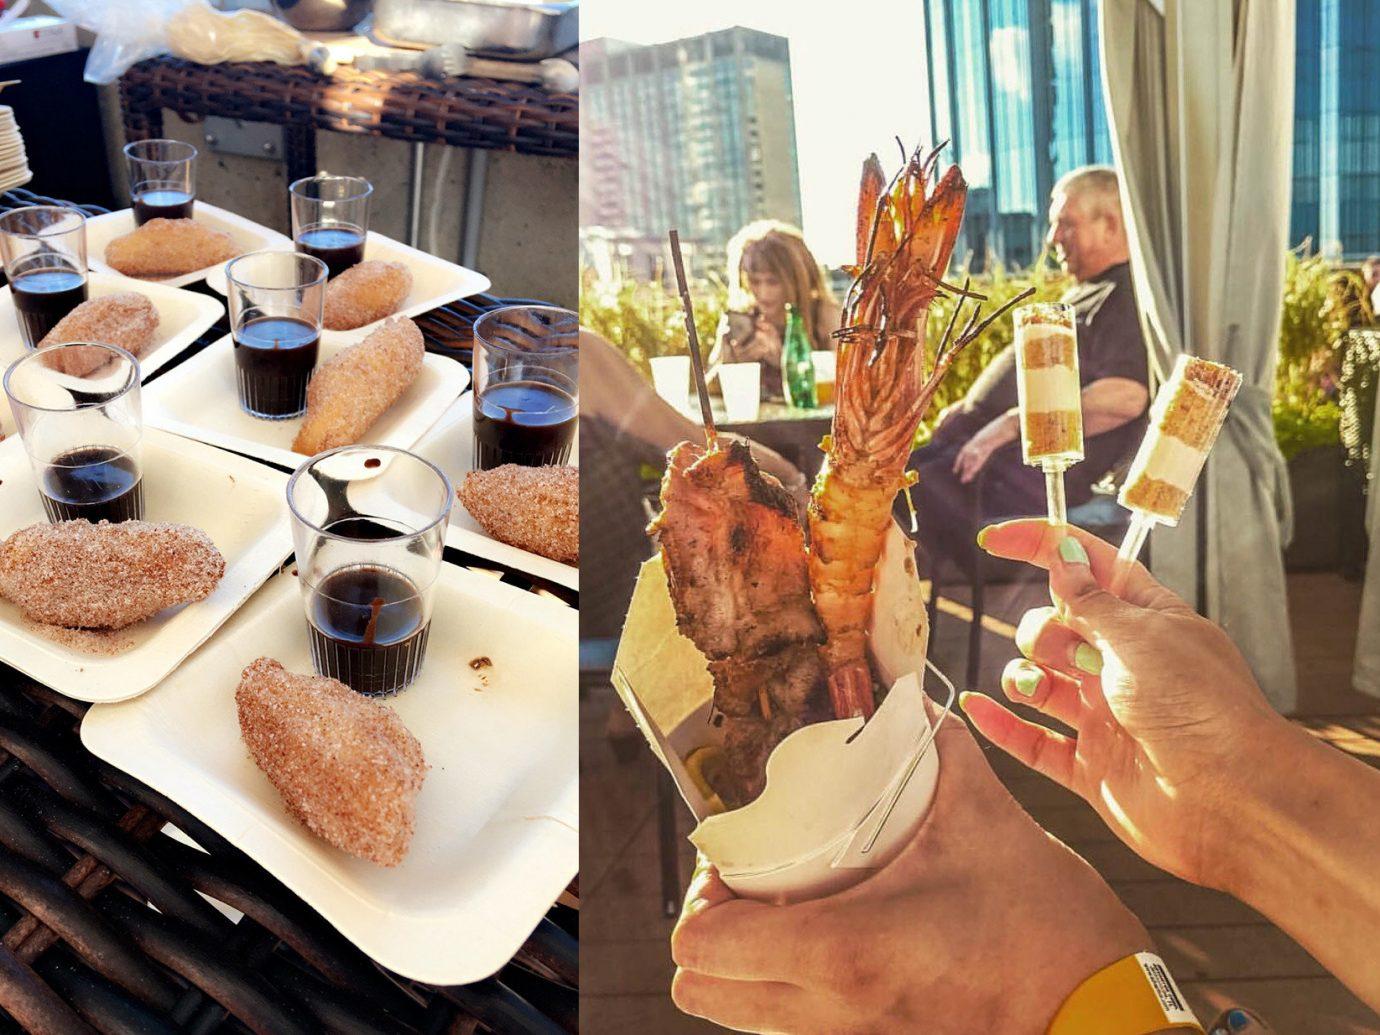 Arts + Culture indoor meal food dish brunch sense breakfast